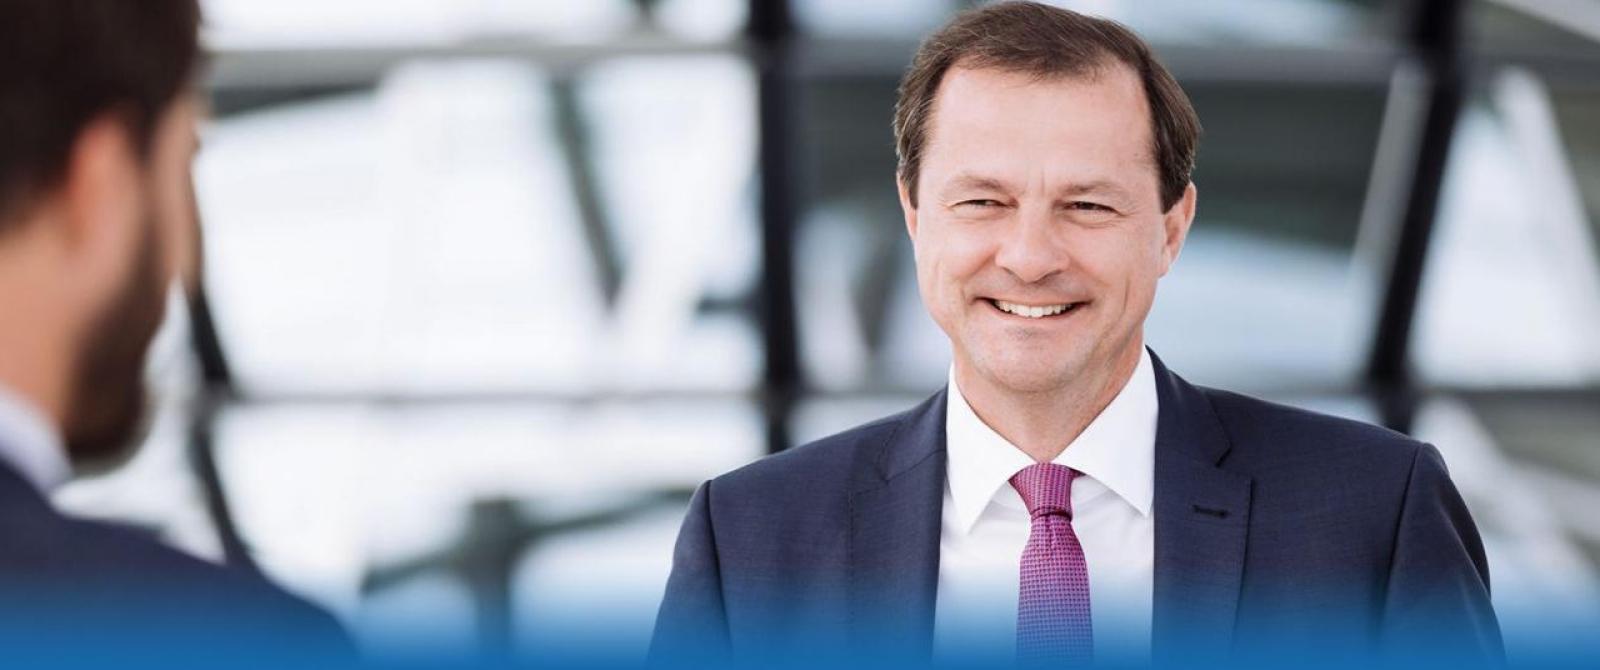 oliver-grundmann-stade-rotenburg-politiker-cdu-berlin-bundestag-mdb (24)